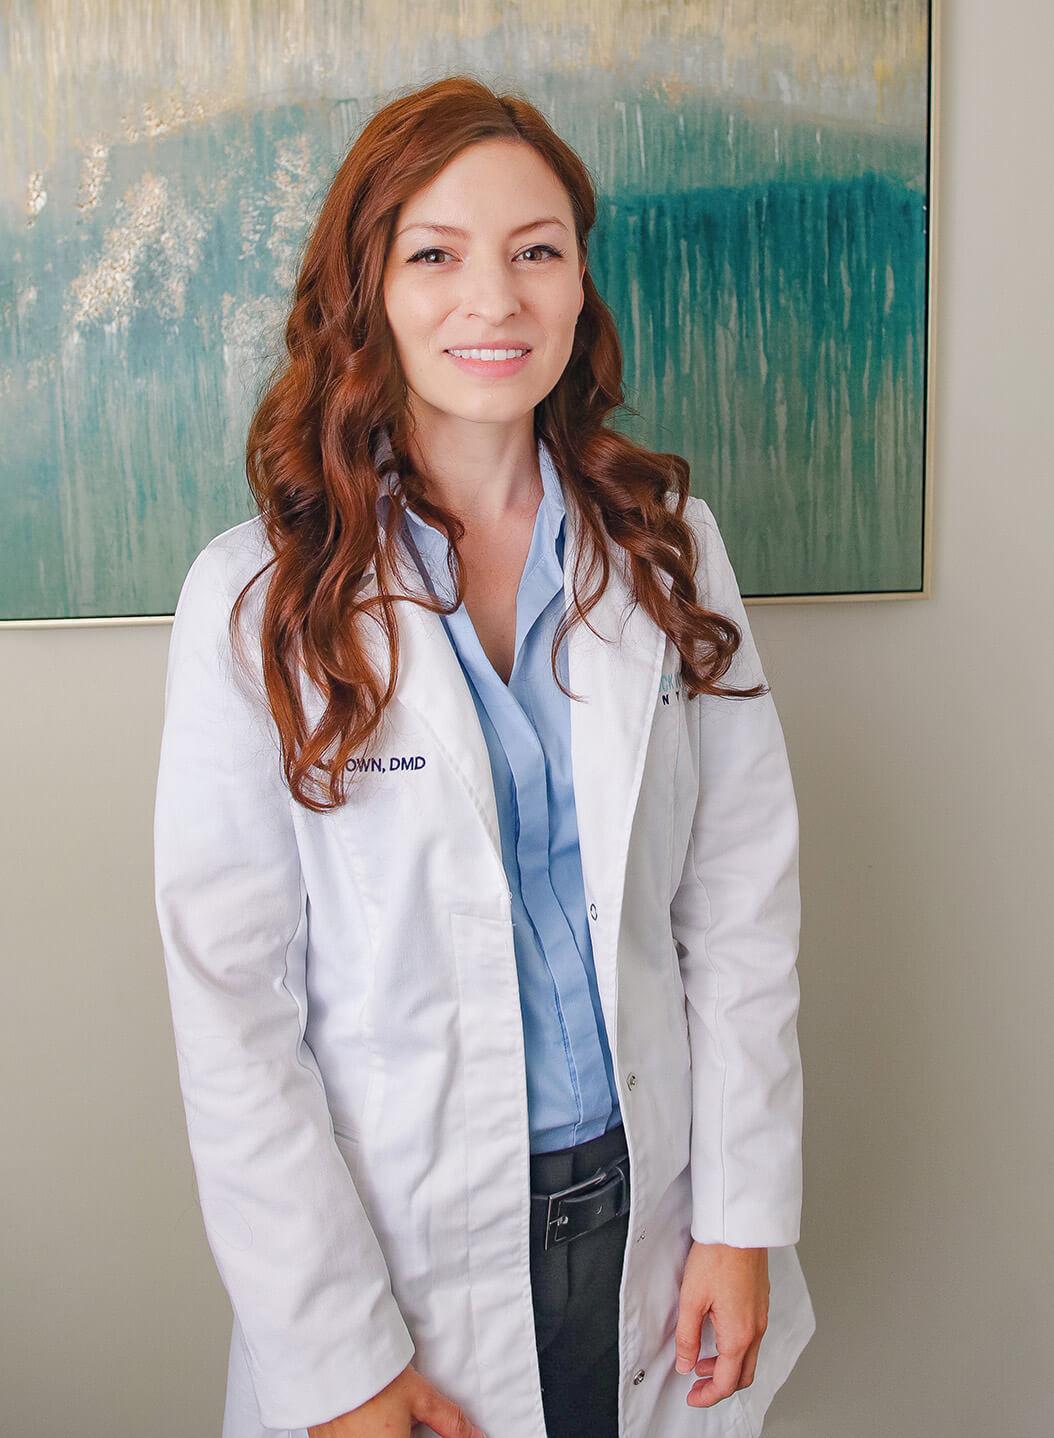 Meet Dr. Aly